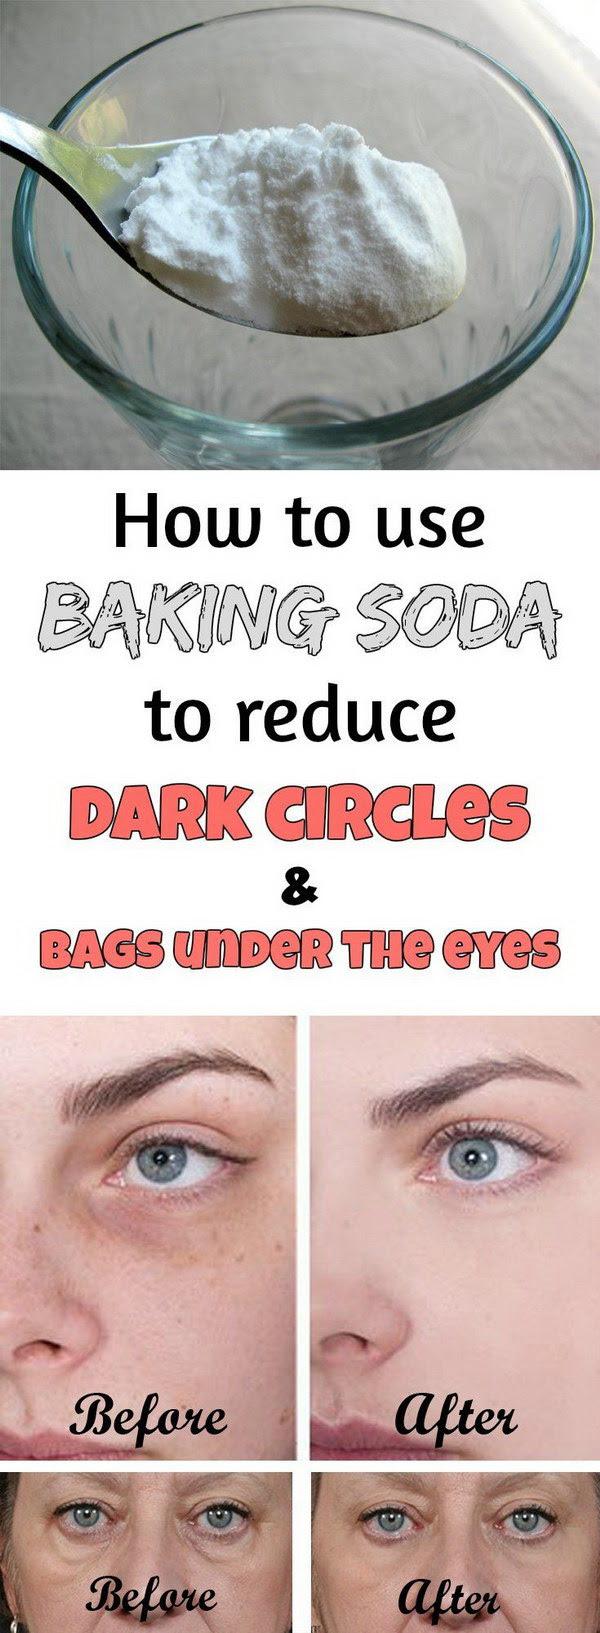 15 Ways to Get Rid of Dark Circles Under Your Eyes - Hative